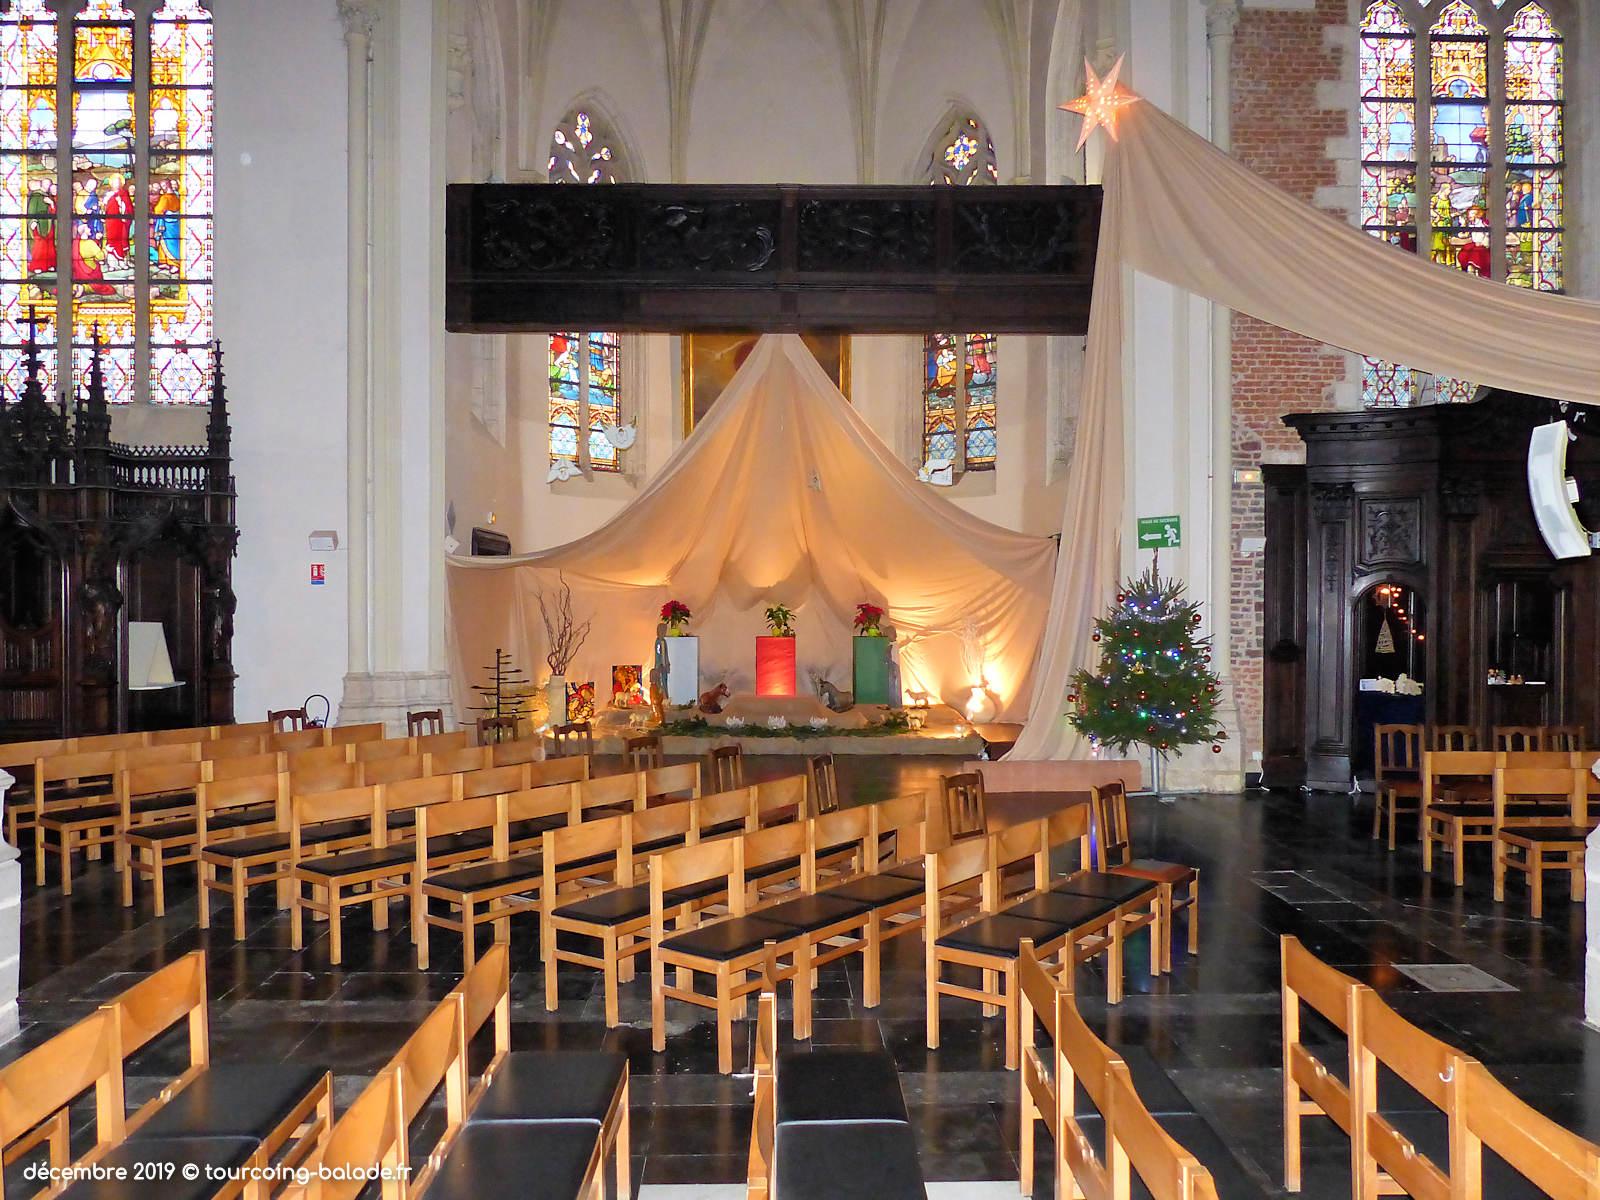 Crèche 2019, Tourcoing église Saint Christophe